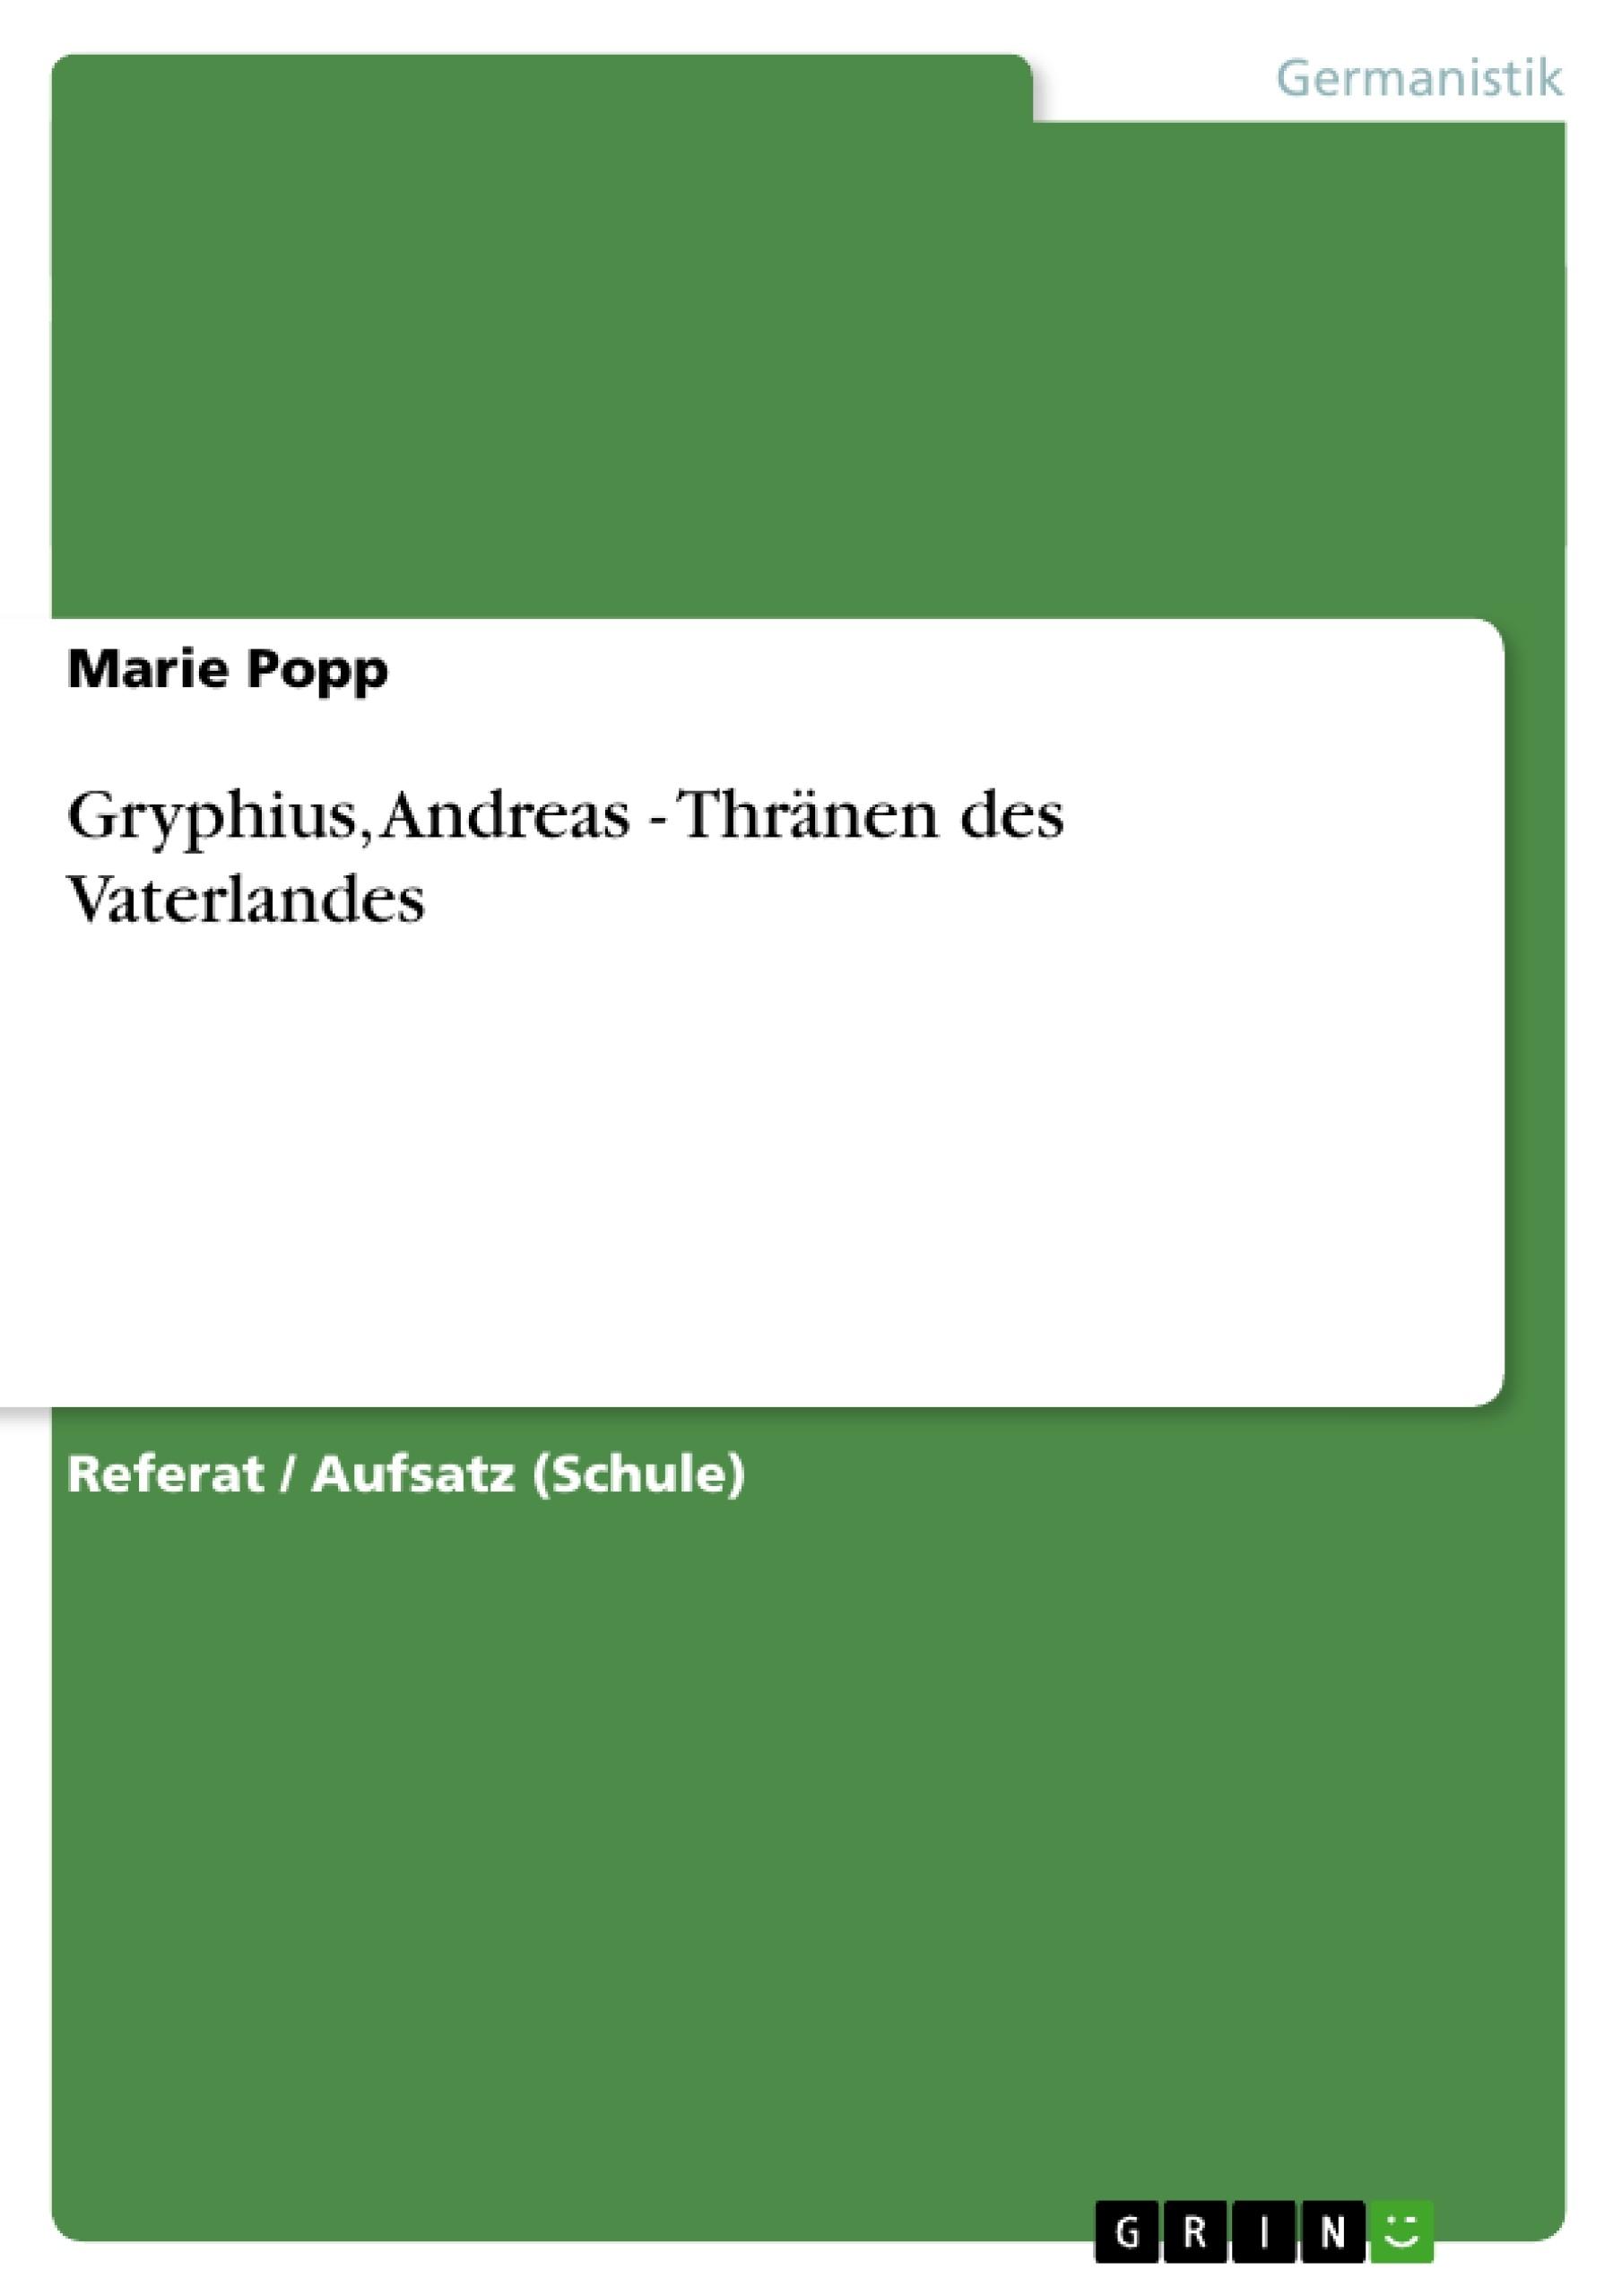 Titel: Gryphius, Andreas - Thränen des Vaterlandes